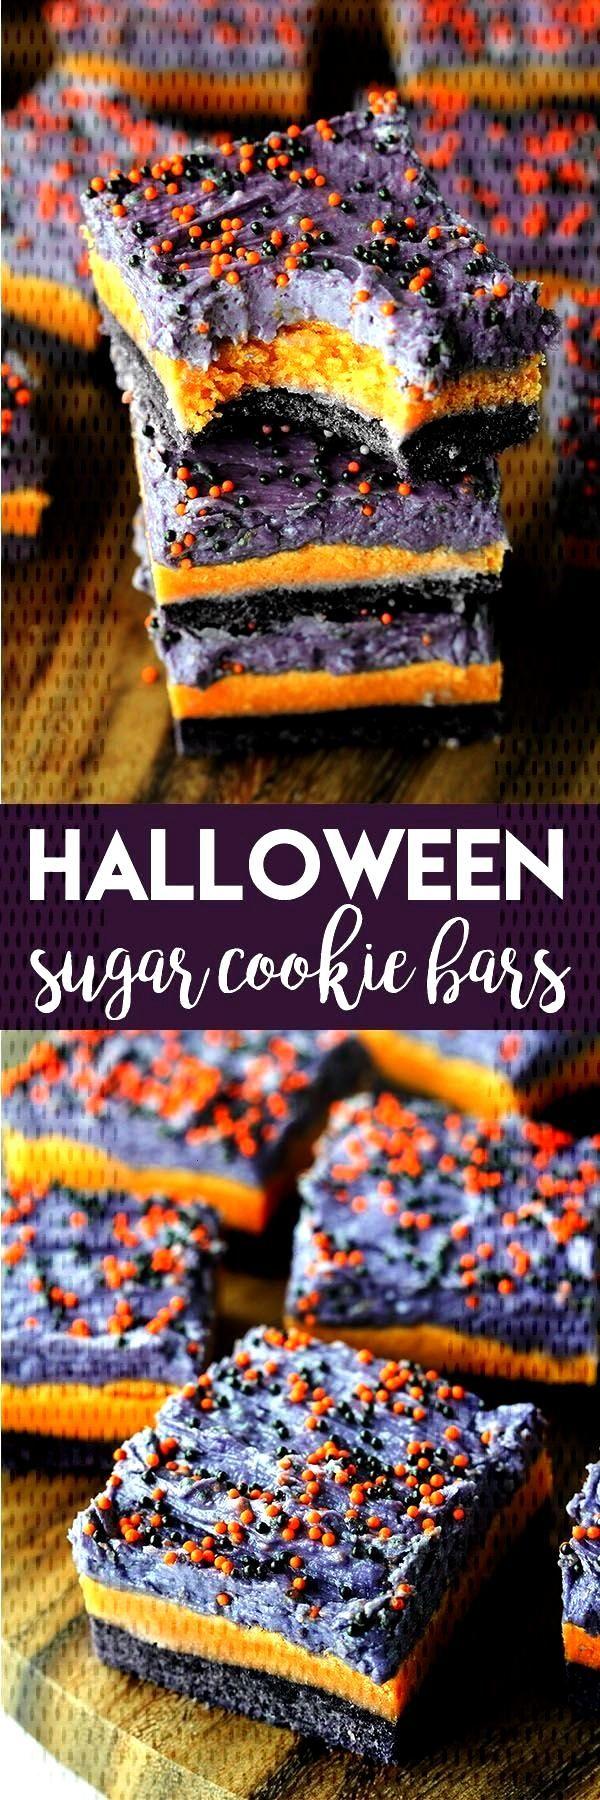 Halloween Sugar Cookie Bars - Sarah High Heels and Grills - Halloween Sugar Cookie Bars    If